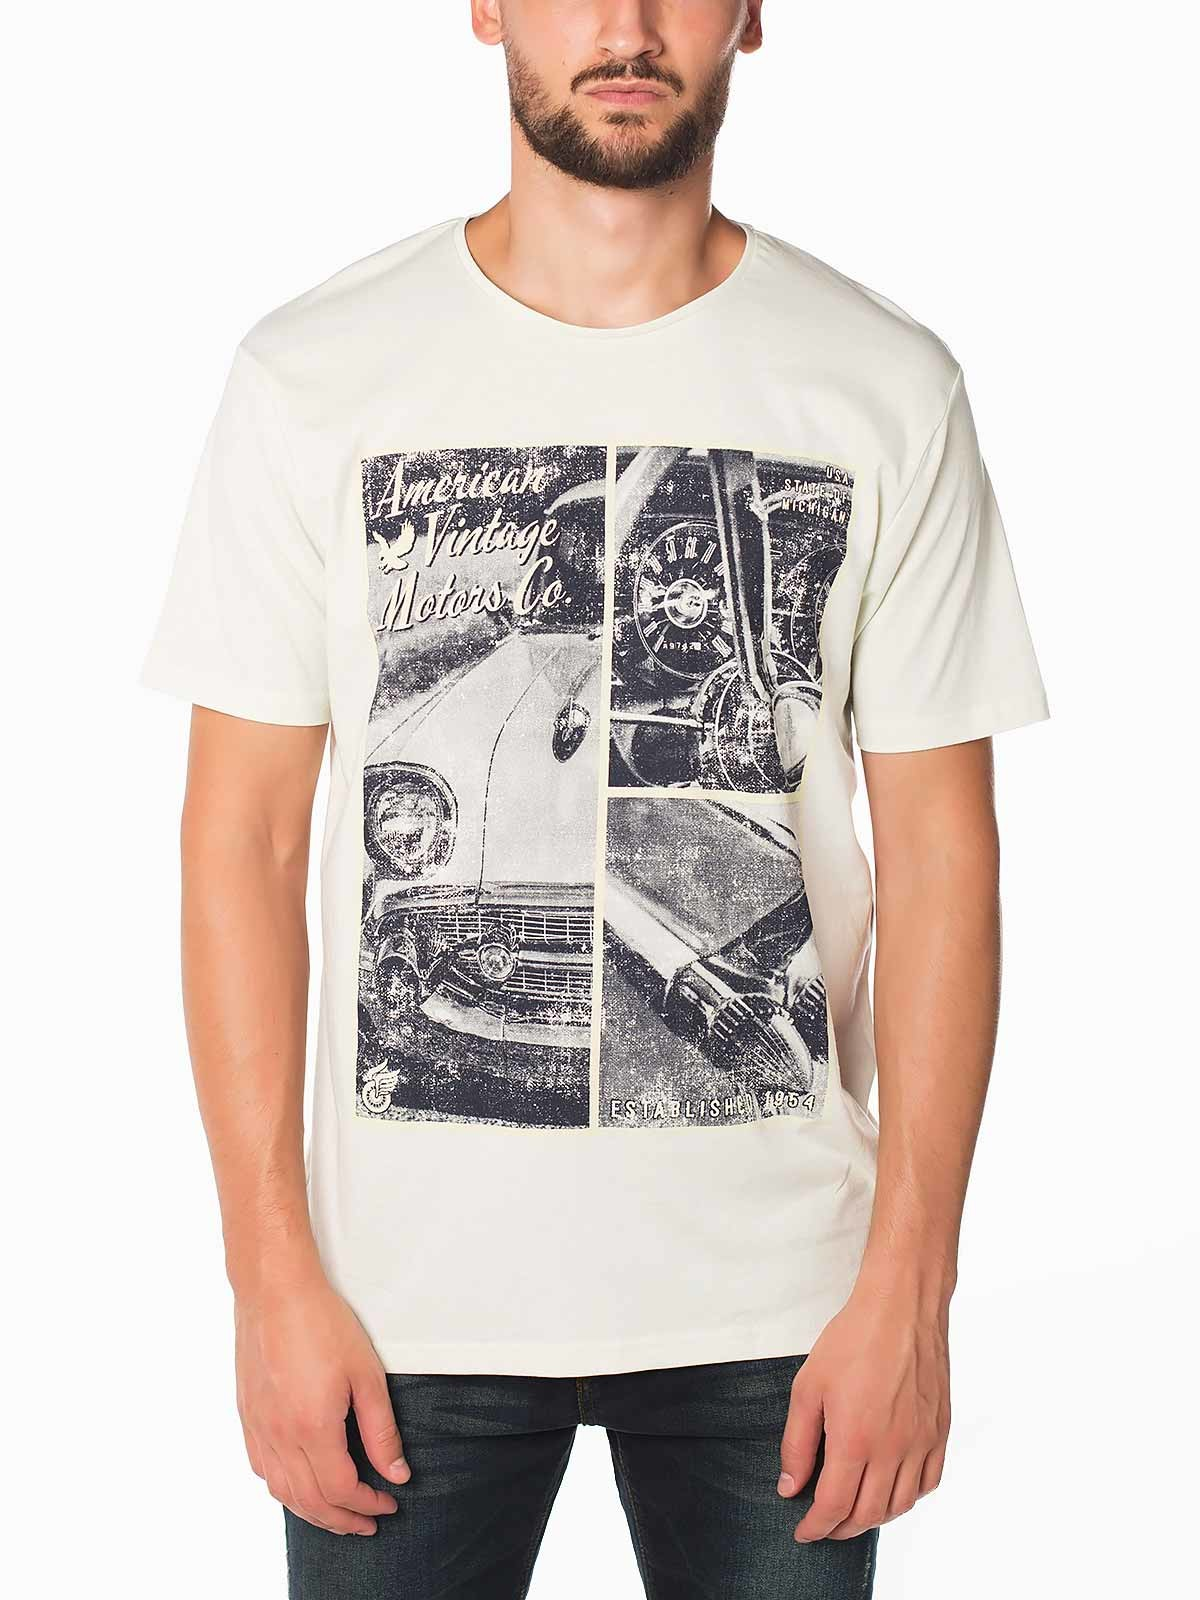 T-shirt manga curta estampada Vintage